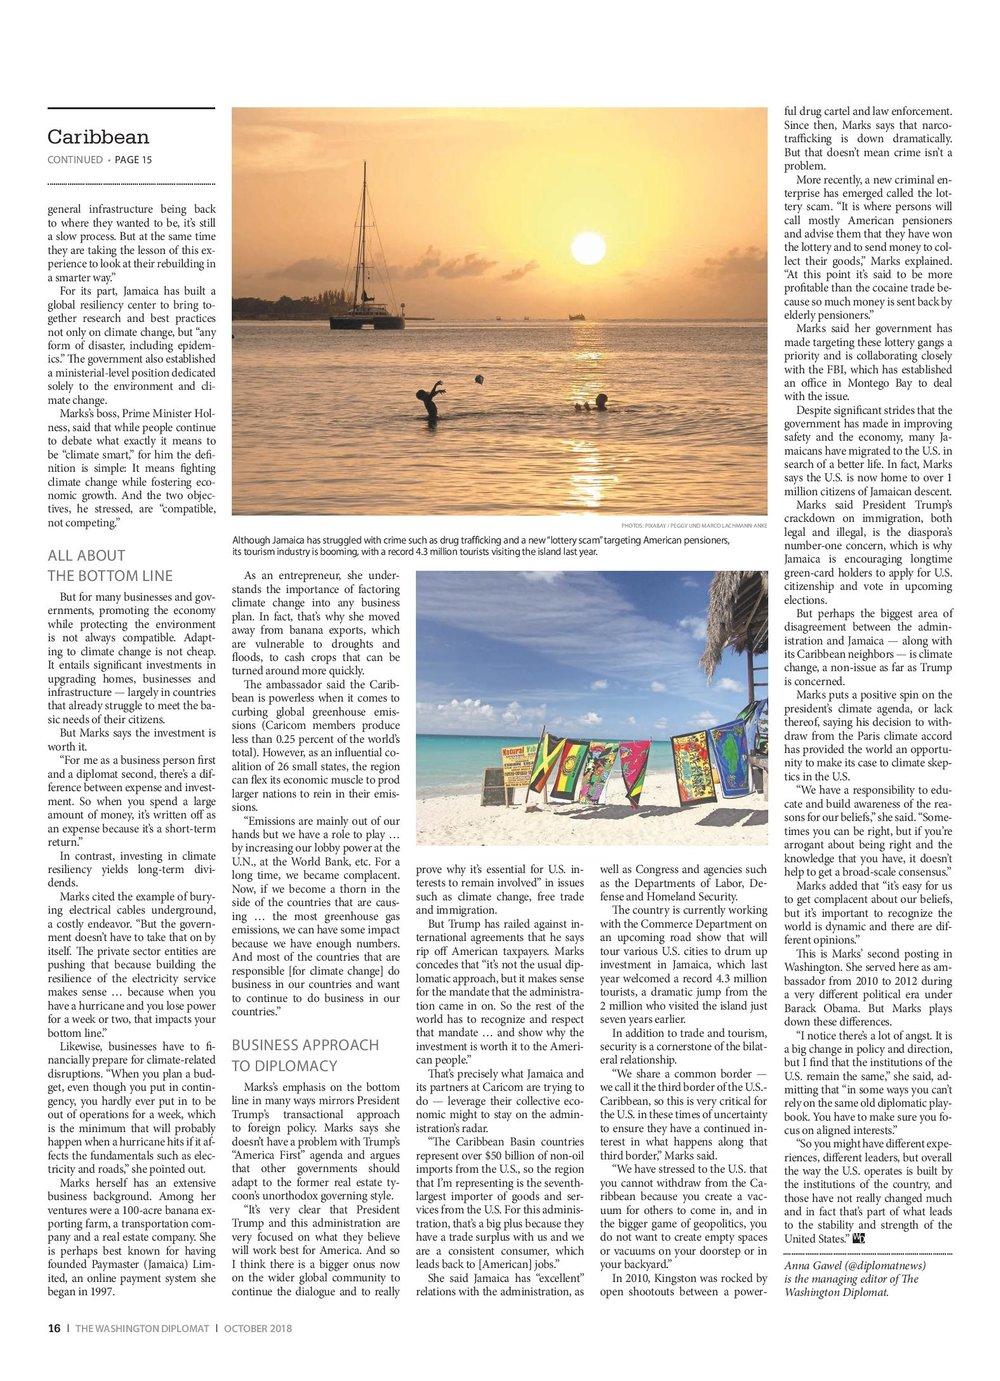 Caribbean-Jamaica-Diplomat-Cover-page-005.jpg